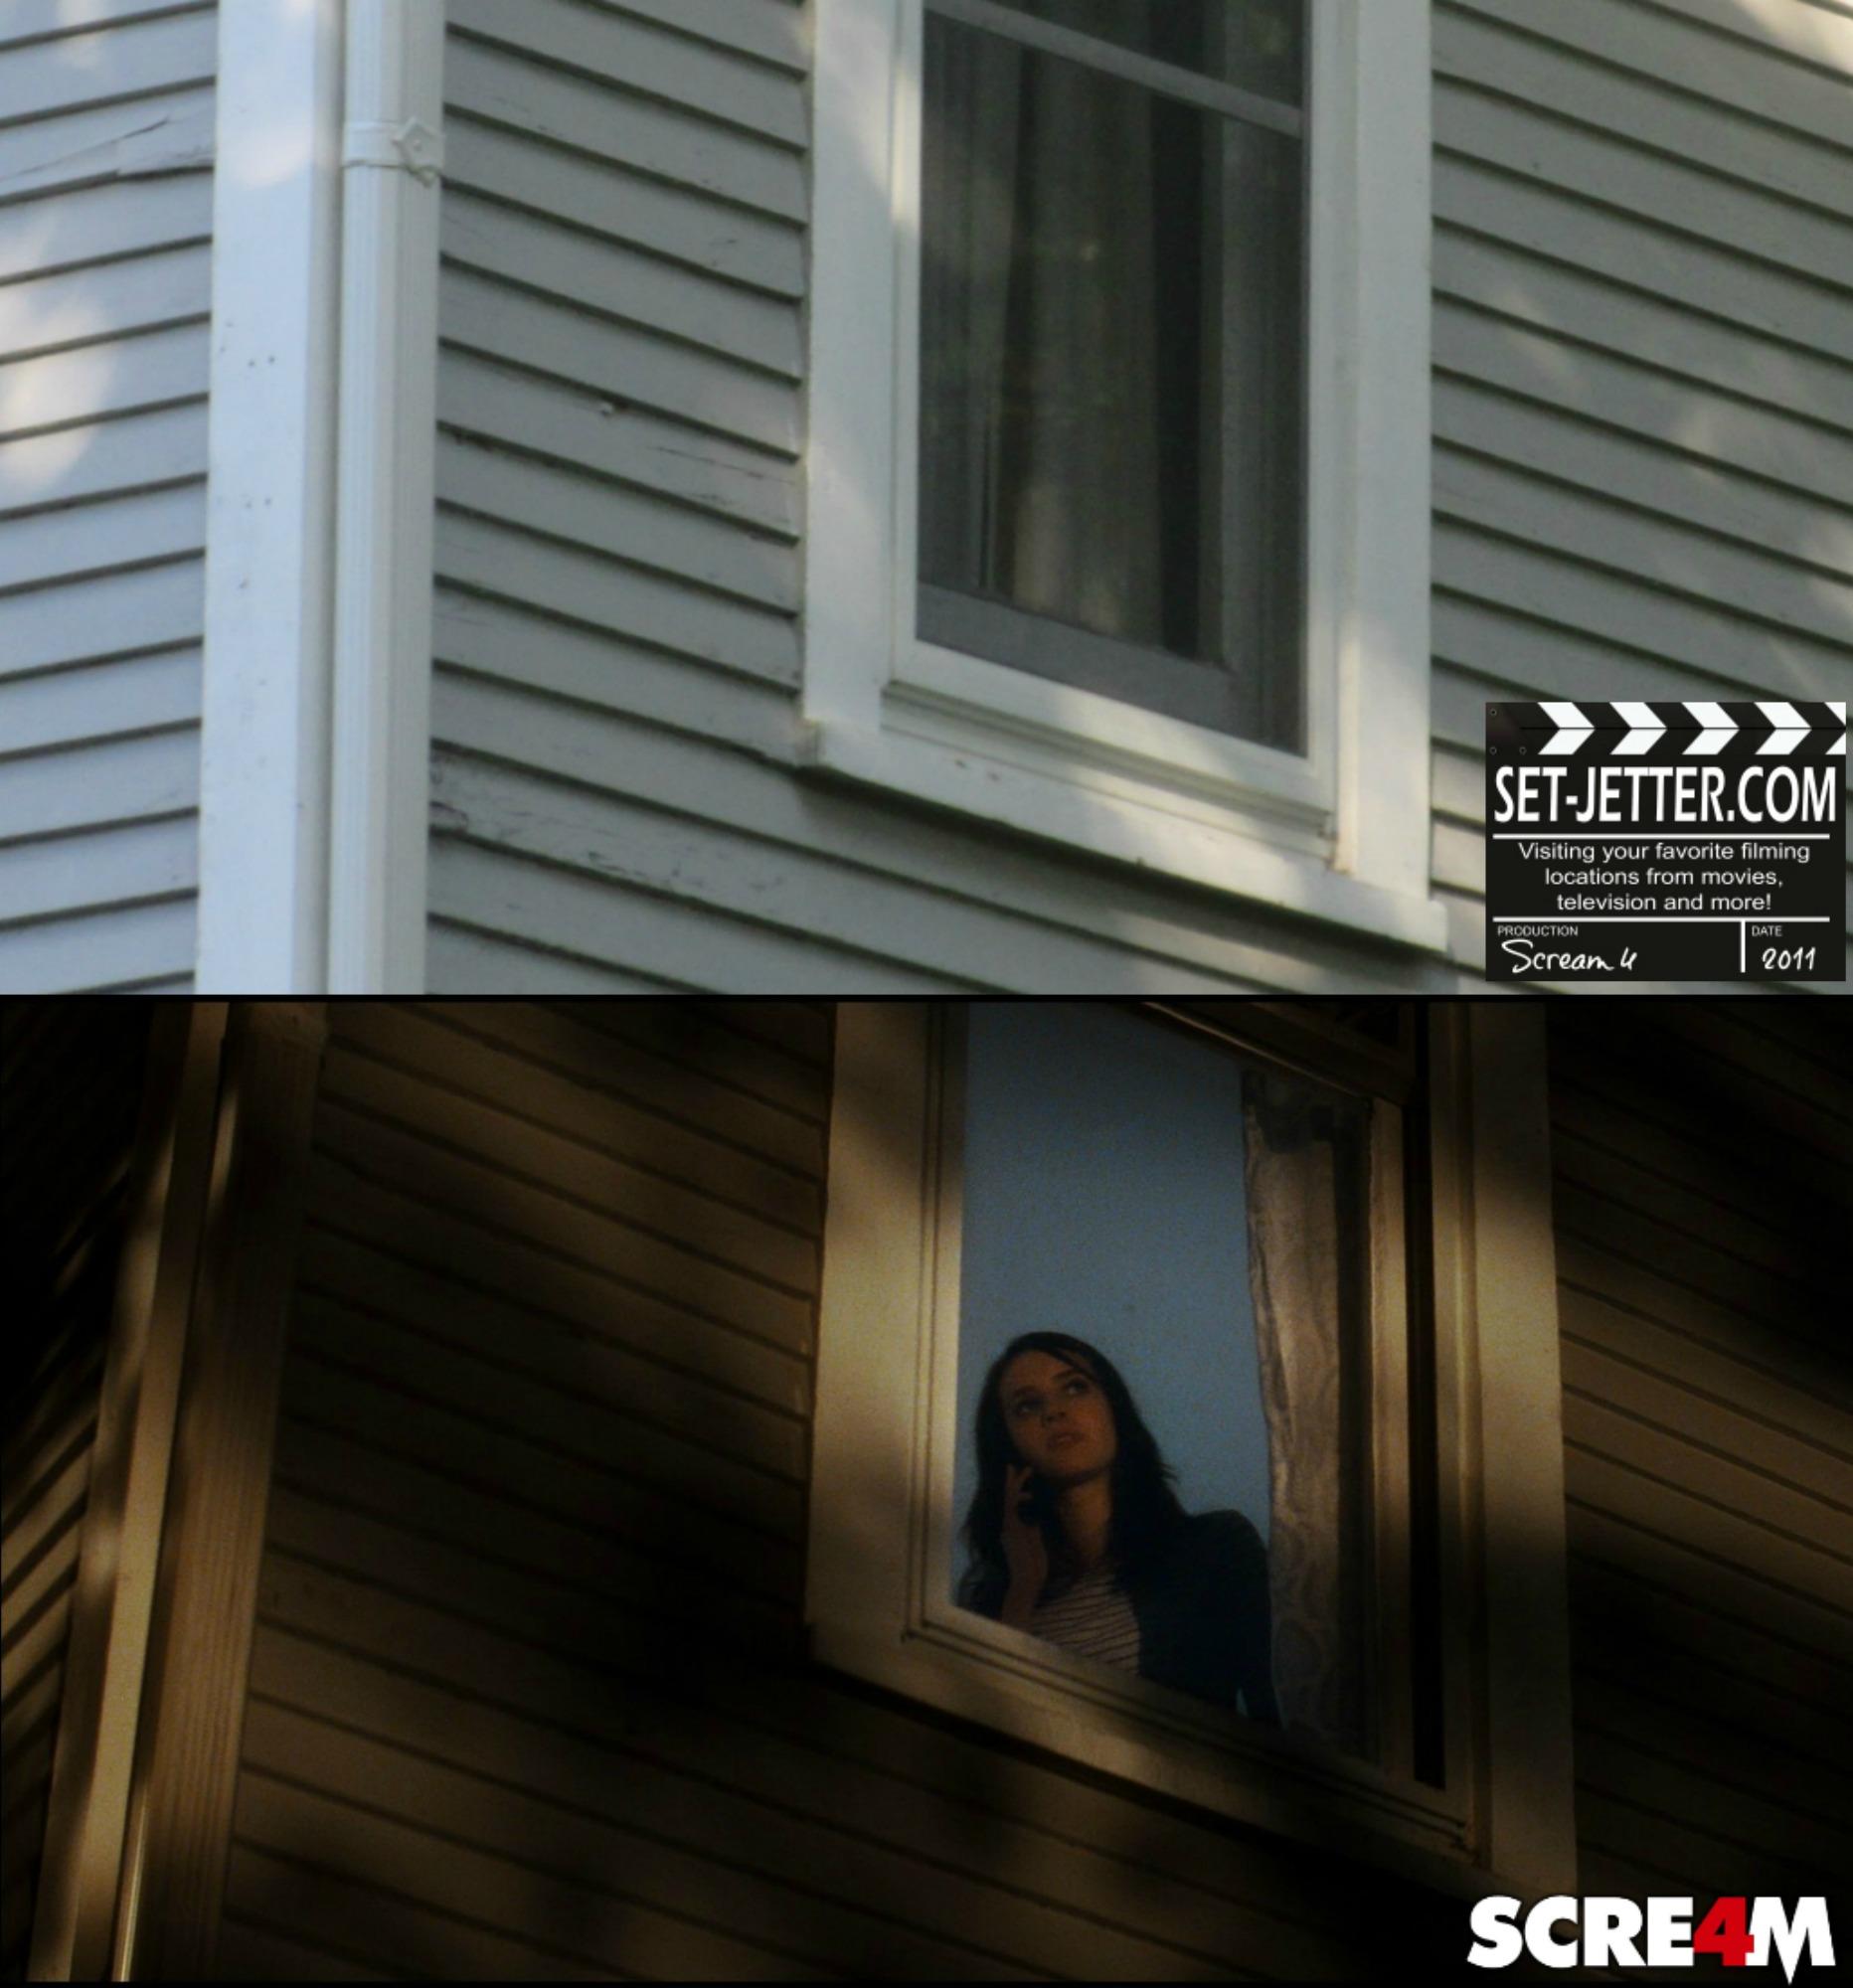 Scream comparison 201.jpg